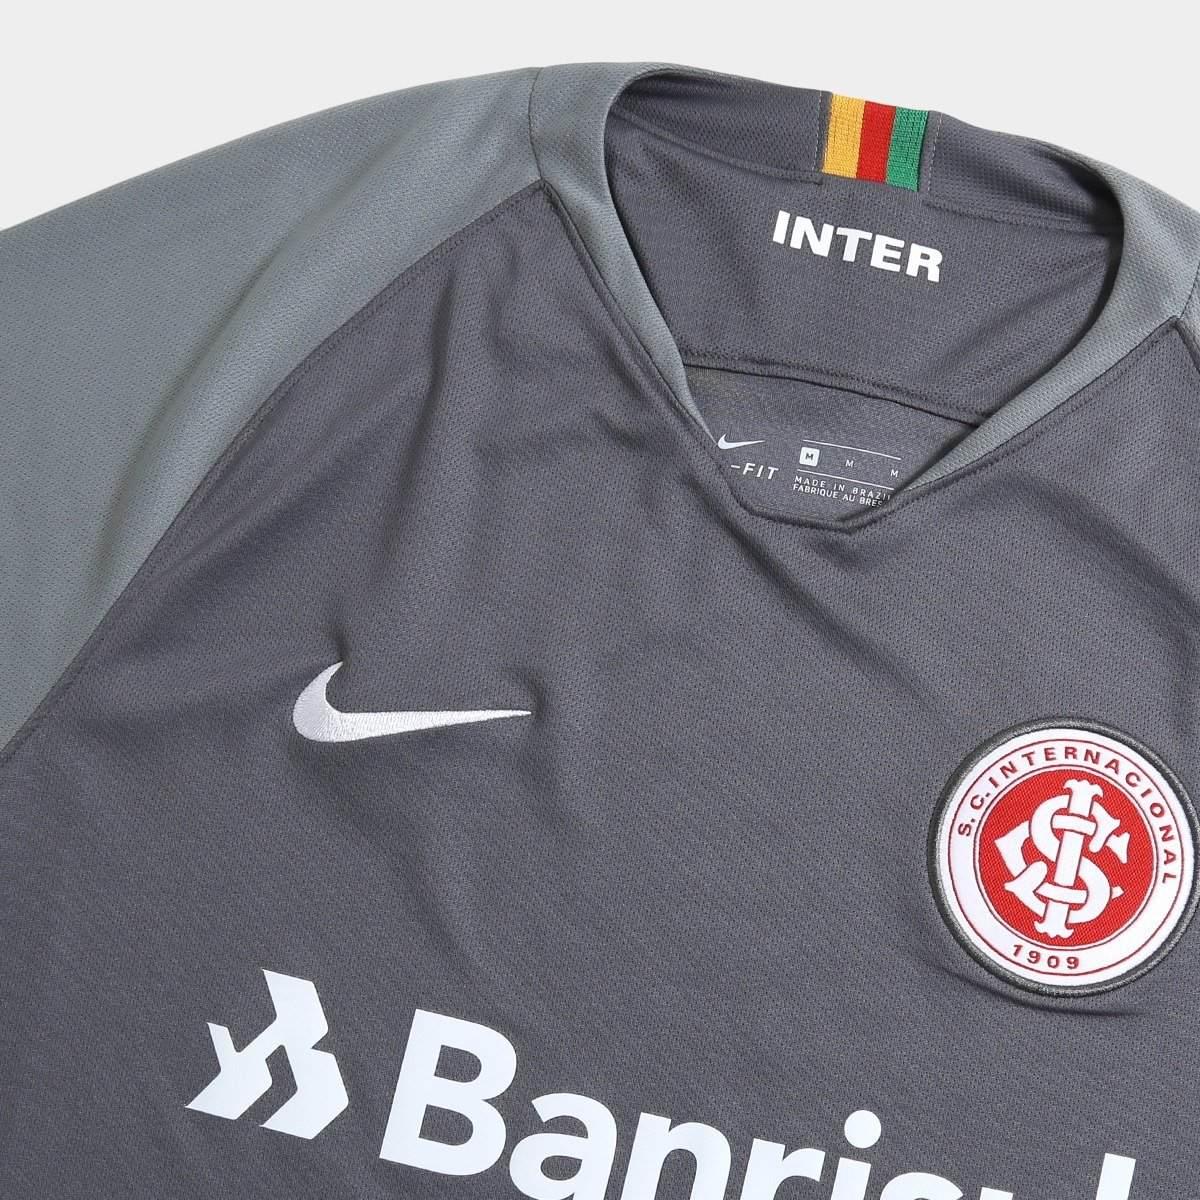 1953232d5b Camisa Internacional 2018 2019 Uniforme 2 Pronta Entrega - R  119